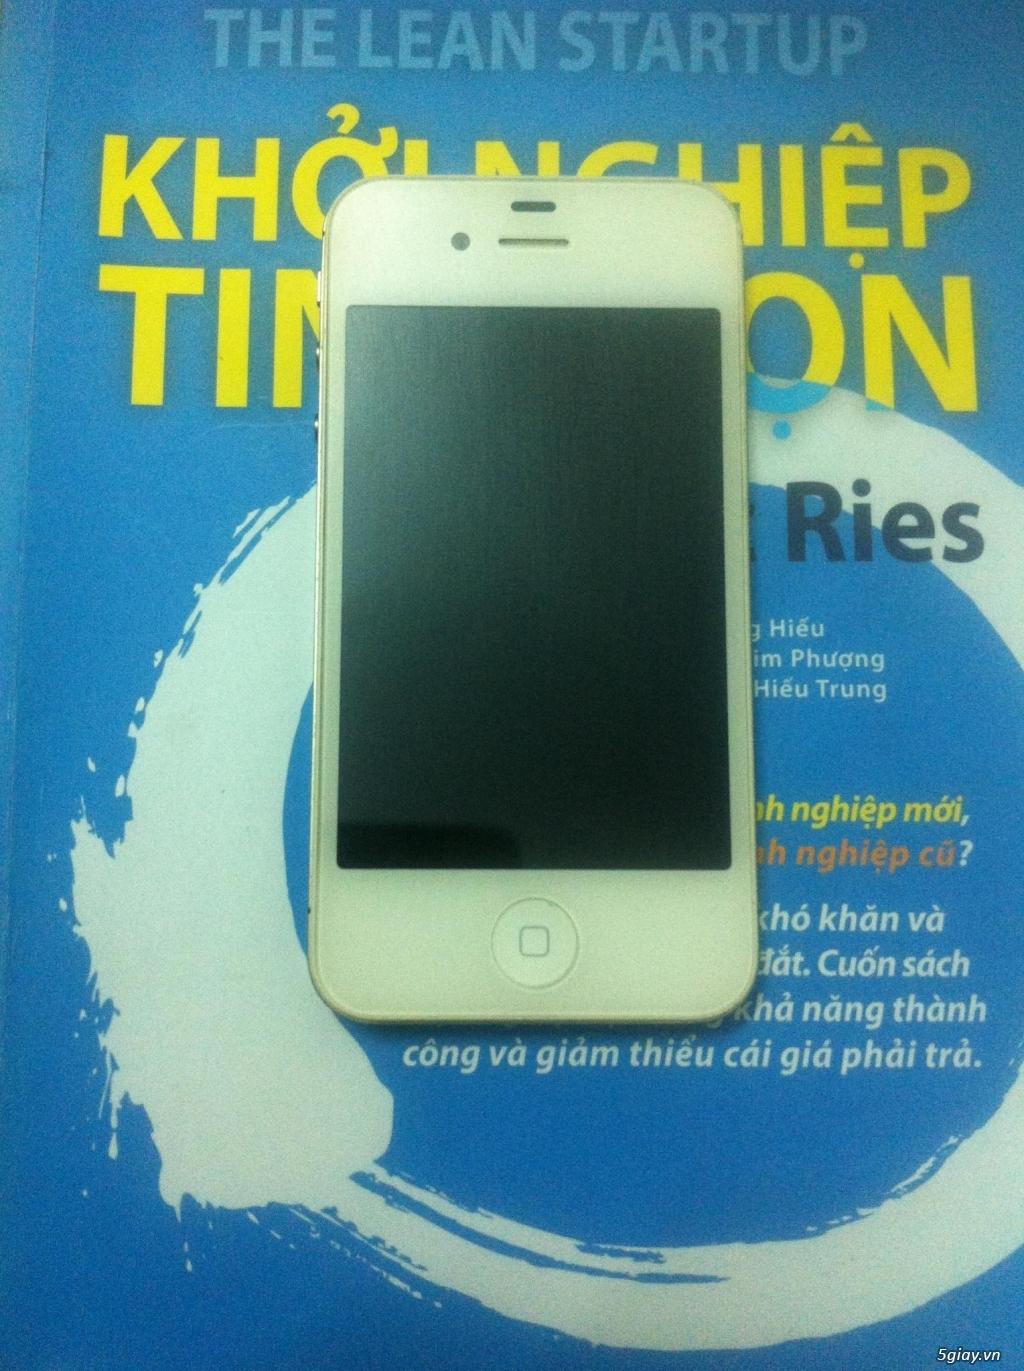 Iphone 4s QT 8gb 550k Ship HCM - 2